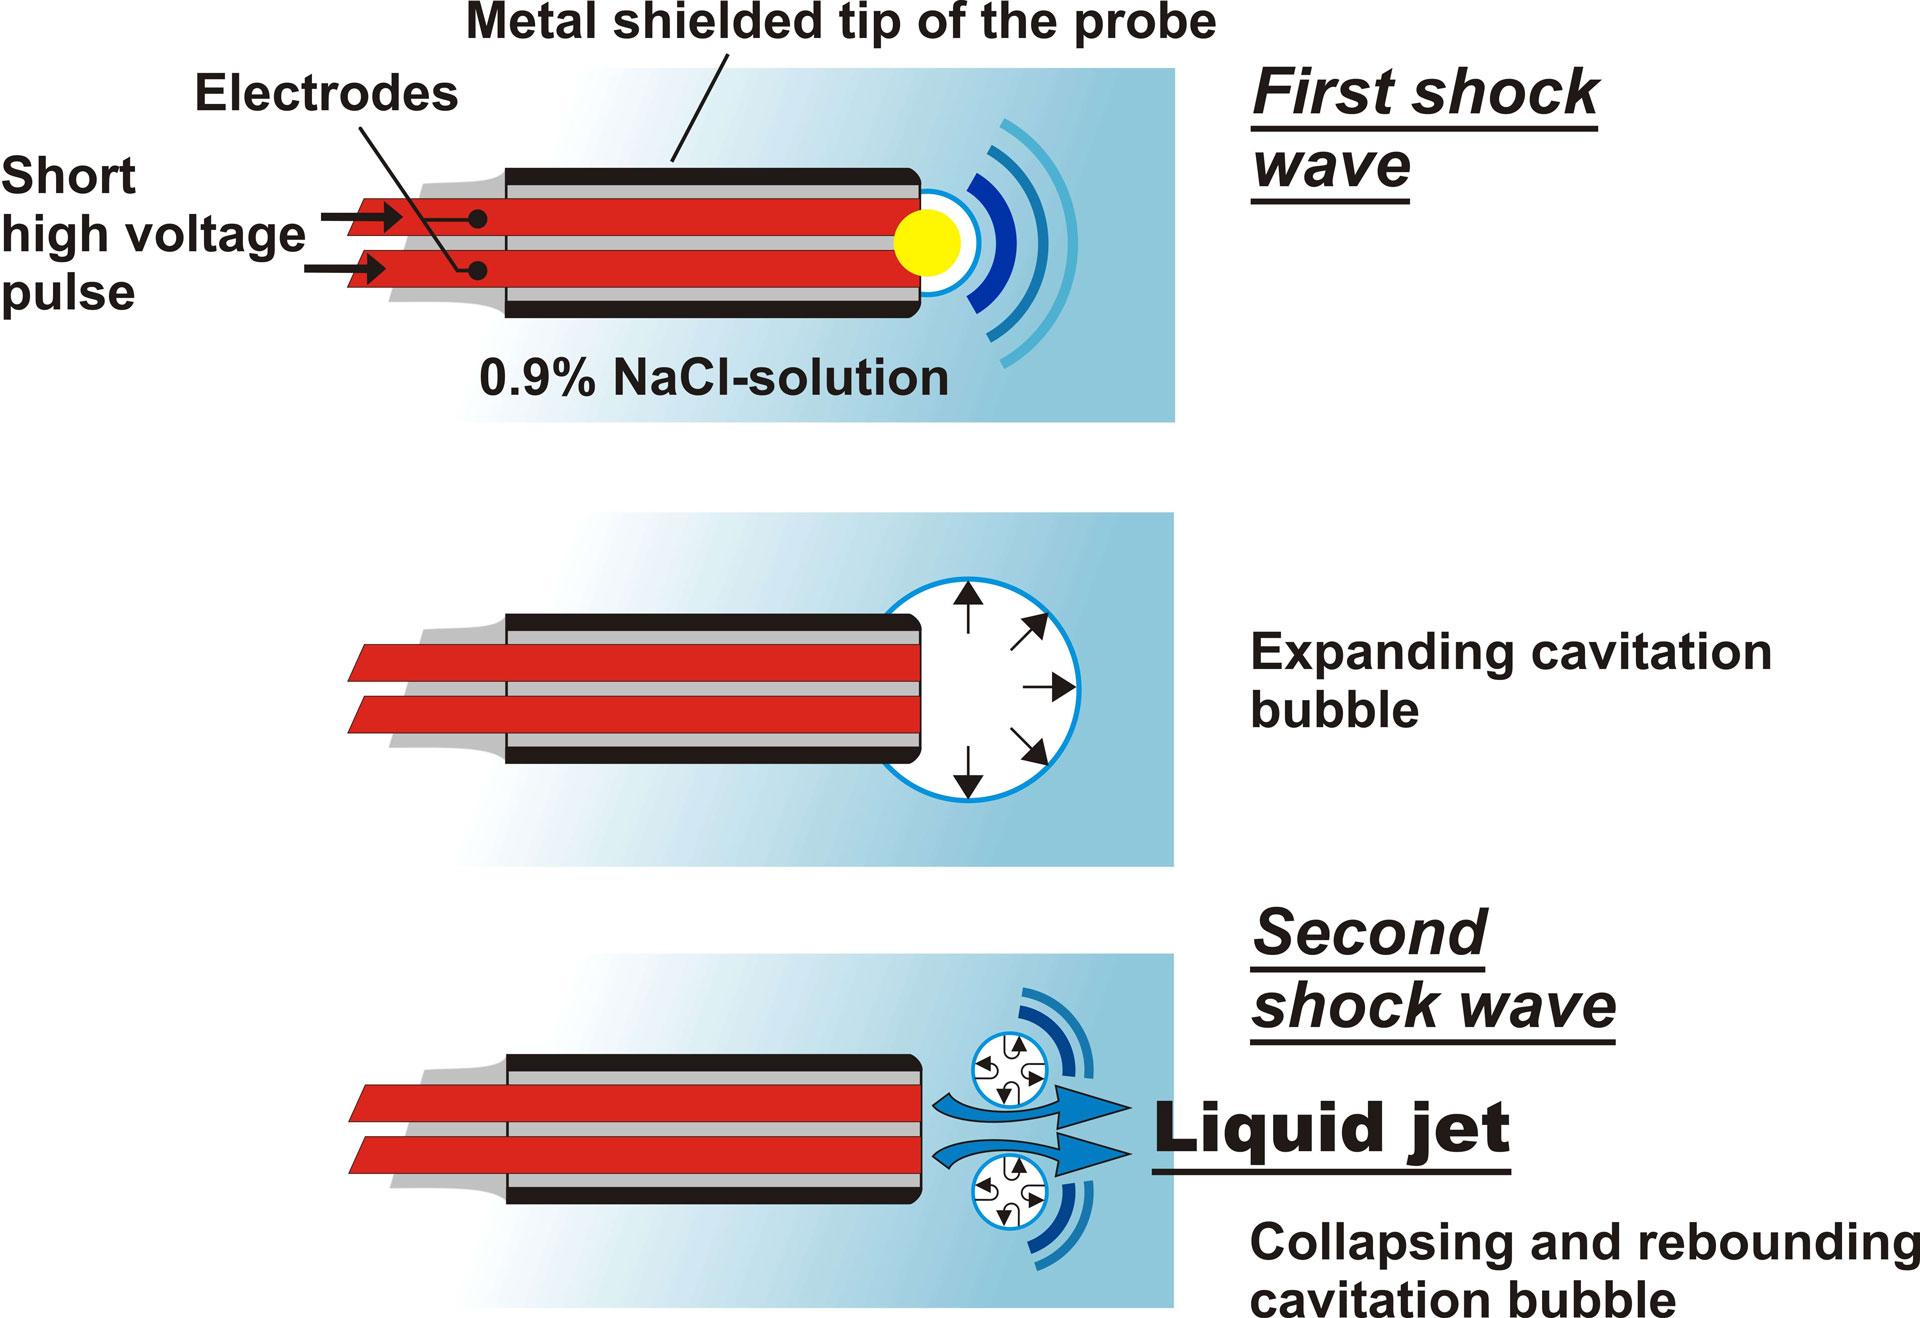 EHL (Electrohydraulic Lithotripsy) | Walz Elektronik F(x) Electric Shock